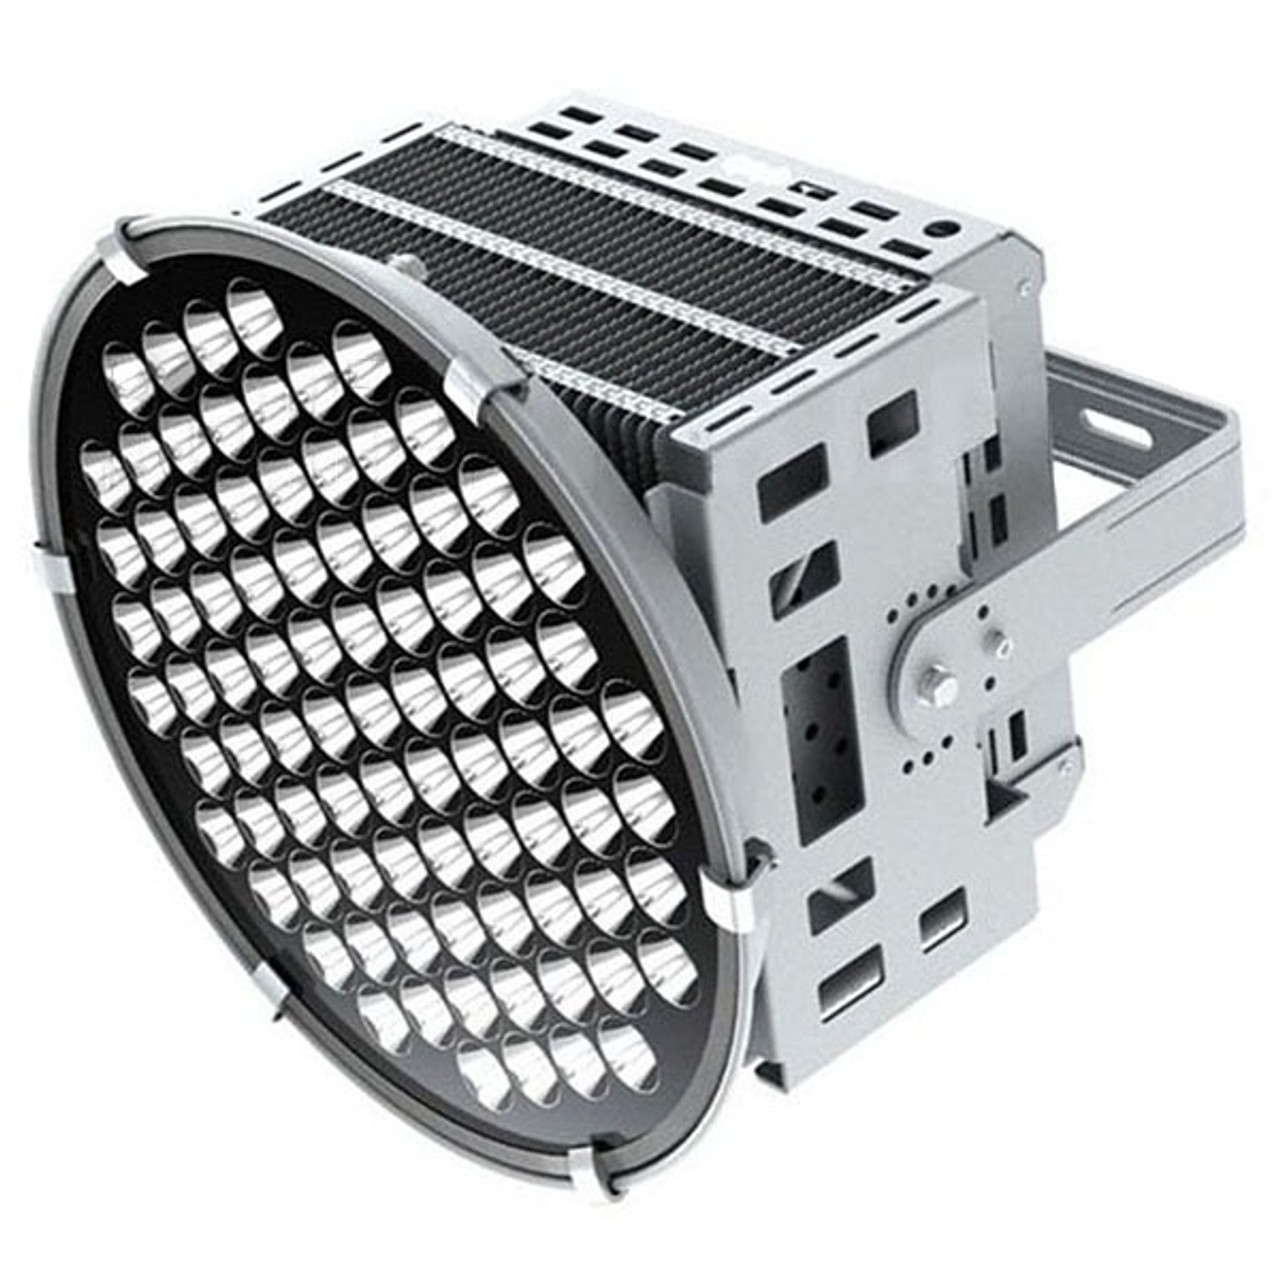 1000 Watt Metal Halide Led Replacement 500 watt high power led sports light, equivalent to 1000-1500 watt metal  halide